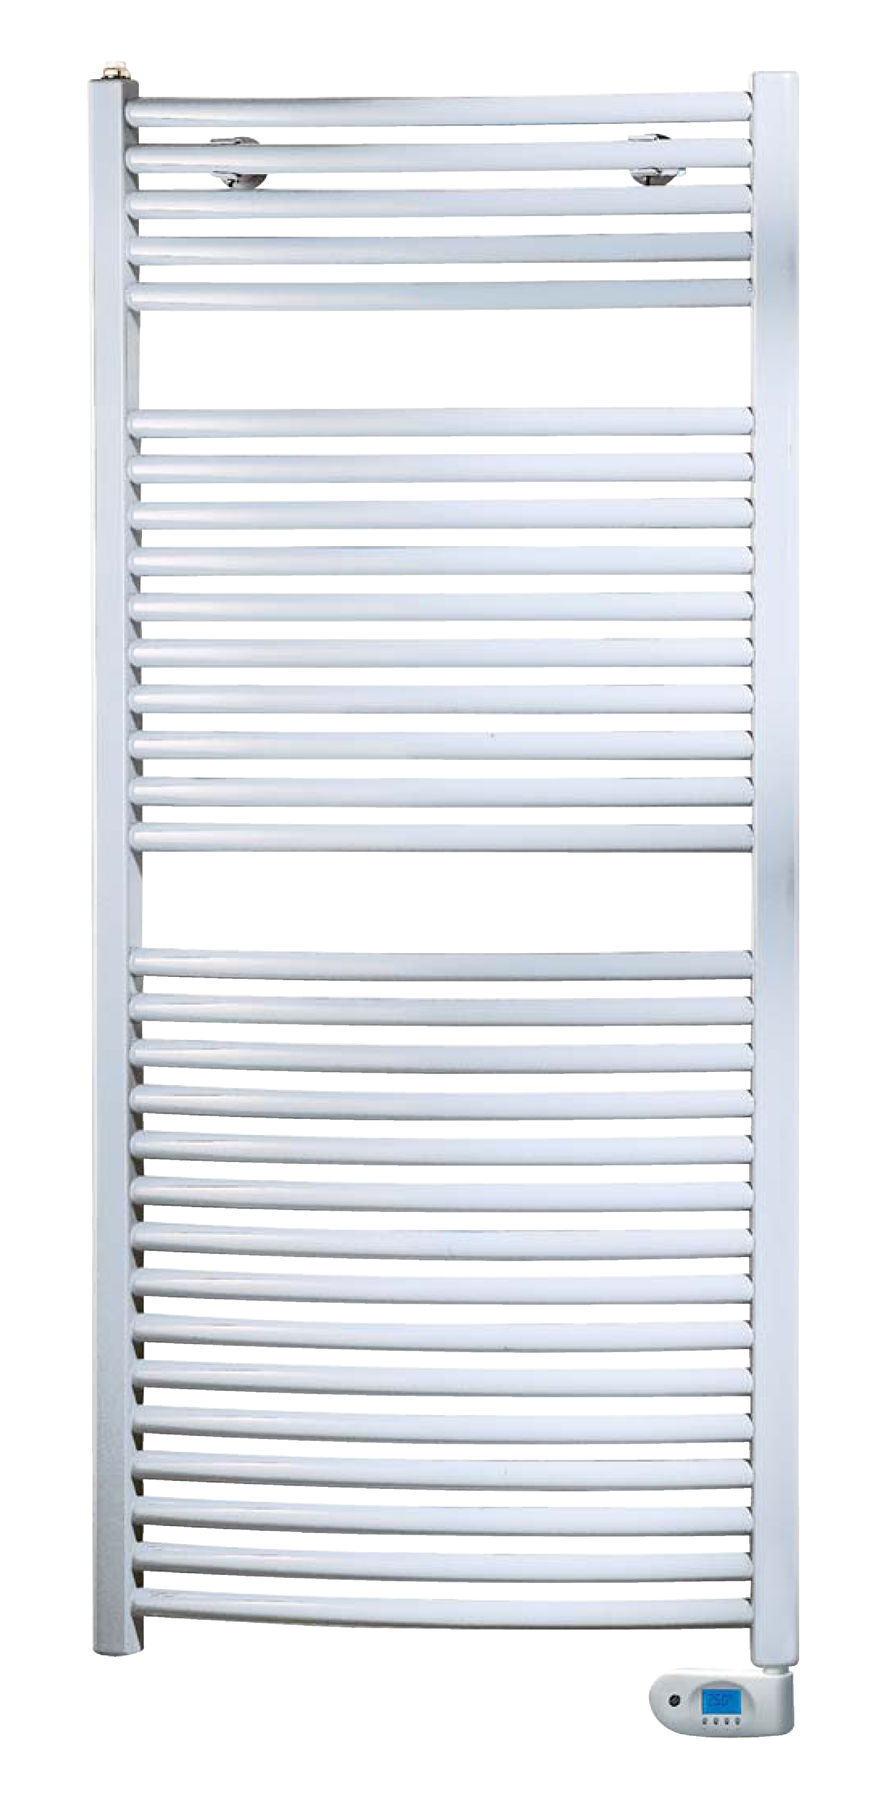 adesio dl radiators radiateur s che serviettes ola 2. Black Bedroom Furniture Sets. Home Design Ideas